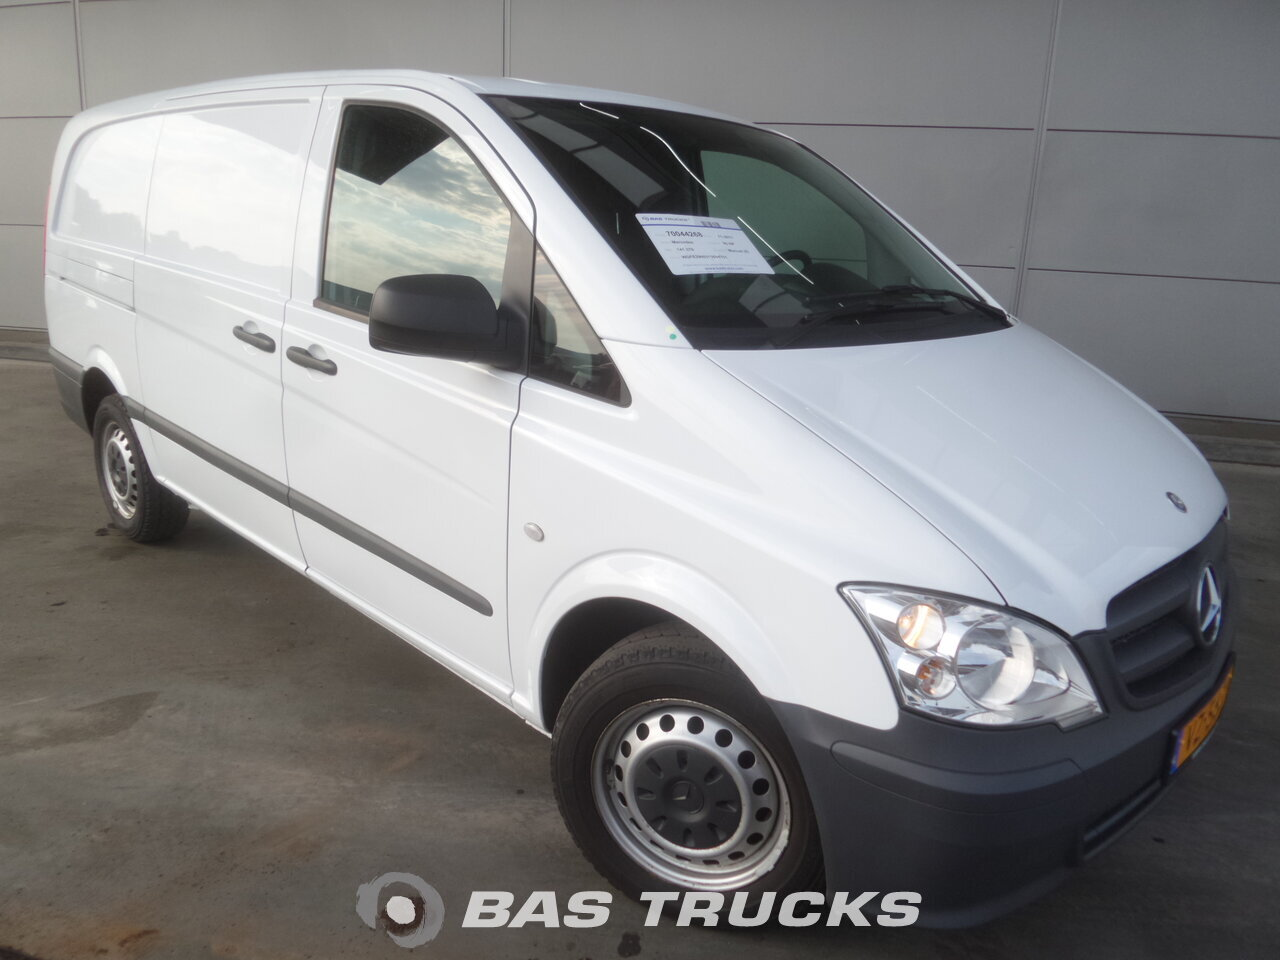 For sale at BAS Trucks: Mercedes Vito 4X2 11/2011